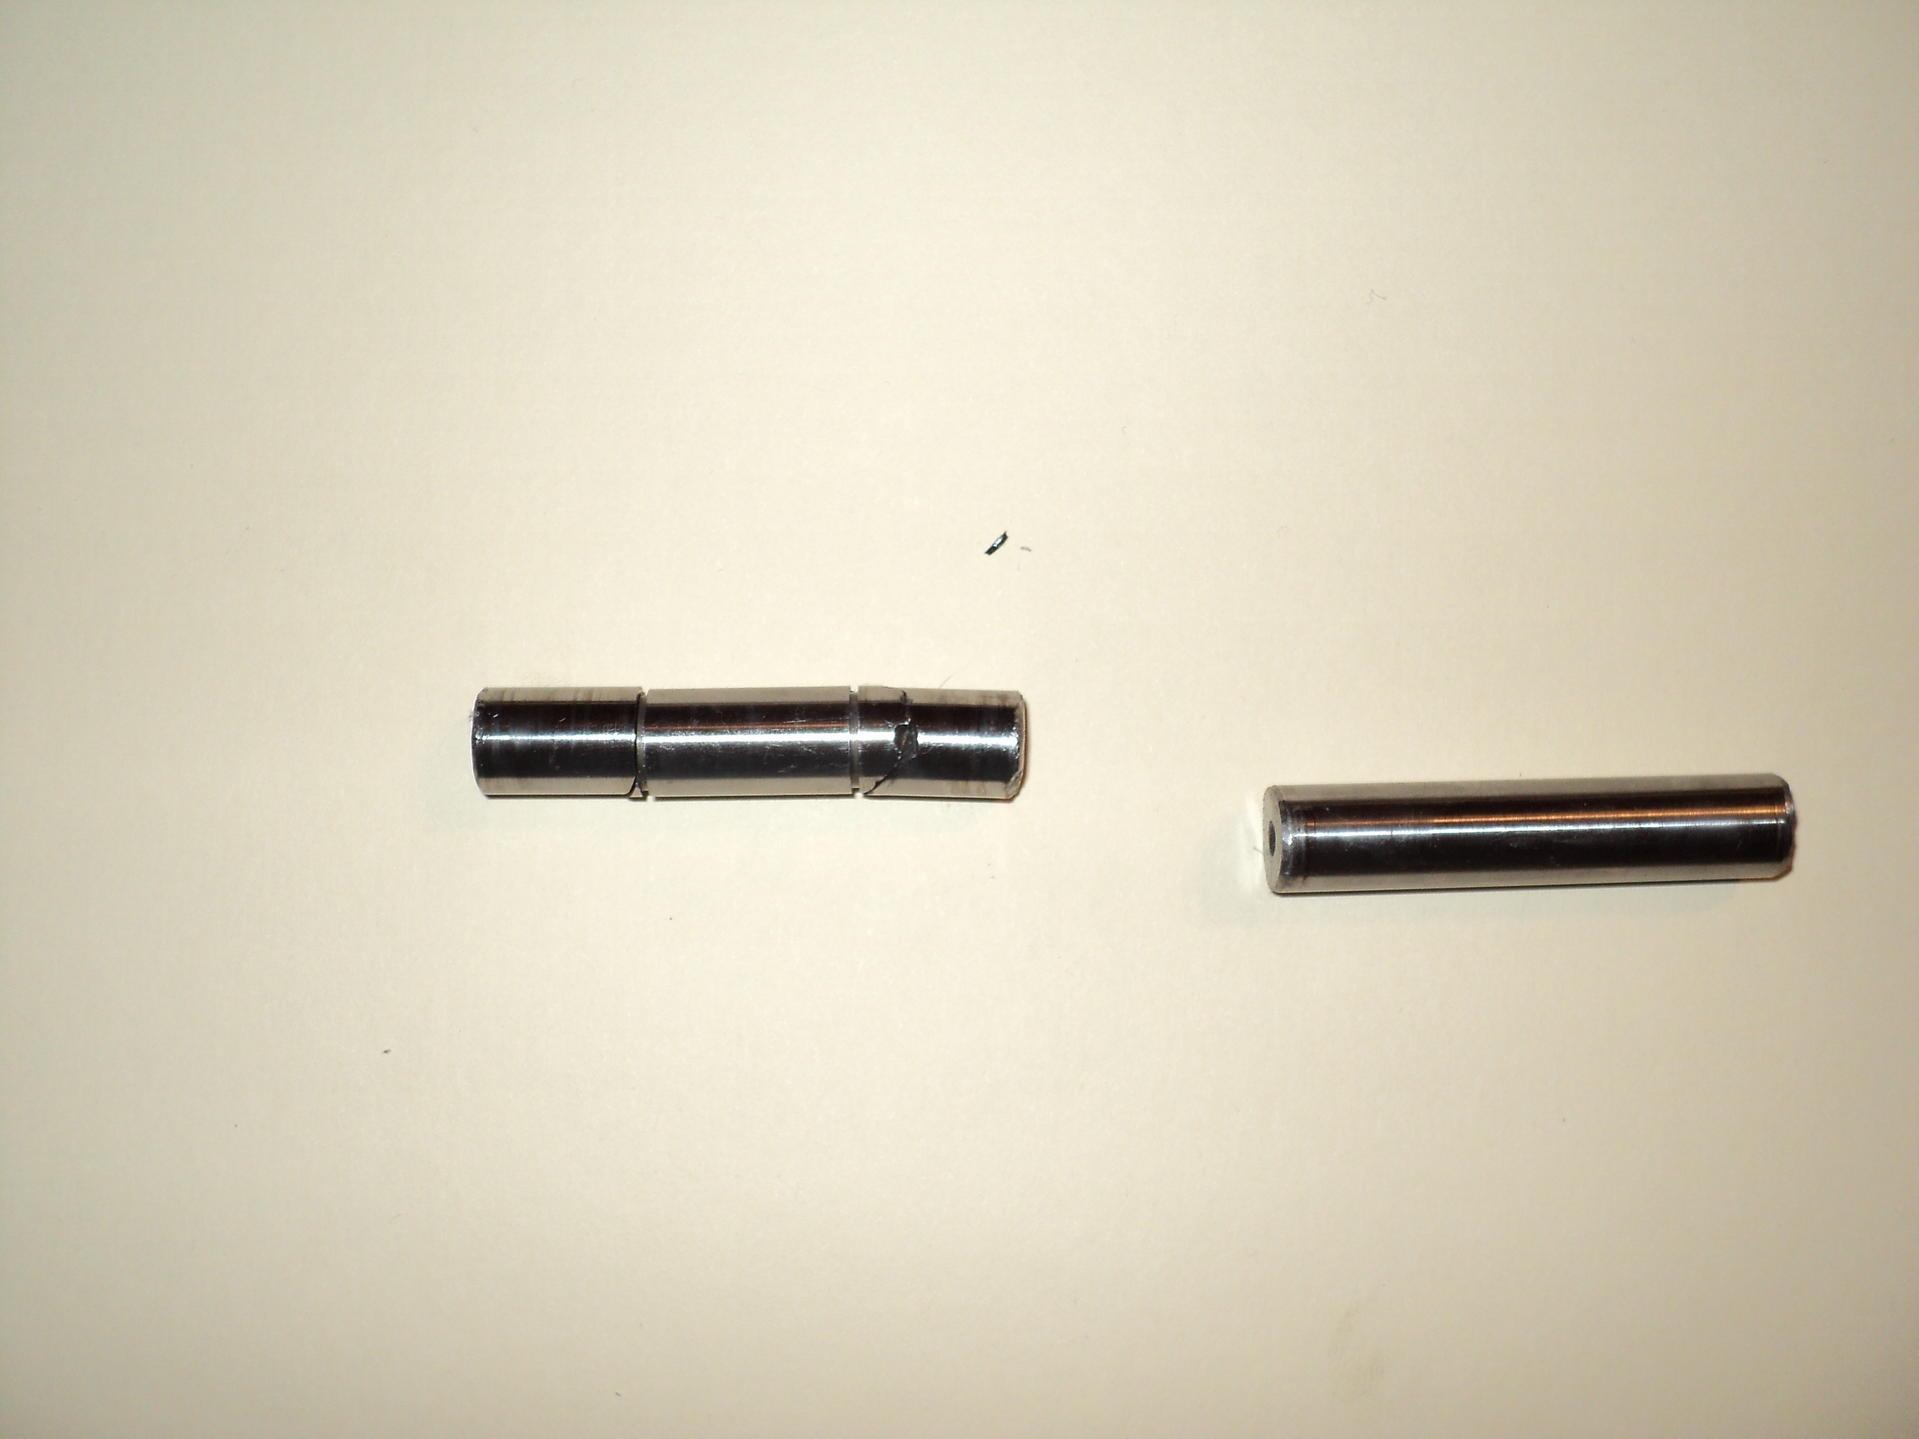 Broke spider gear pin-spider-gear-pin-041.jpg